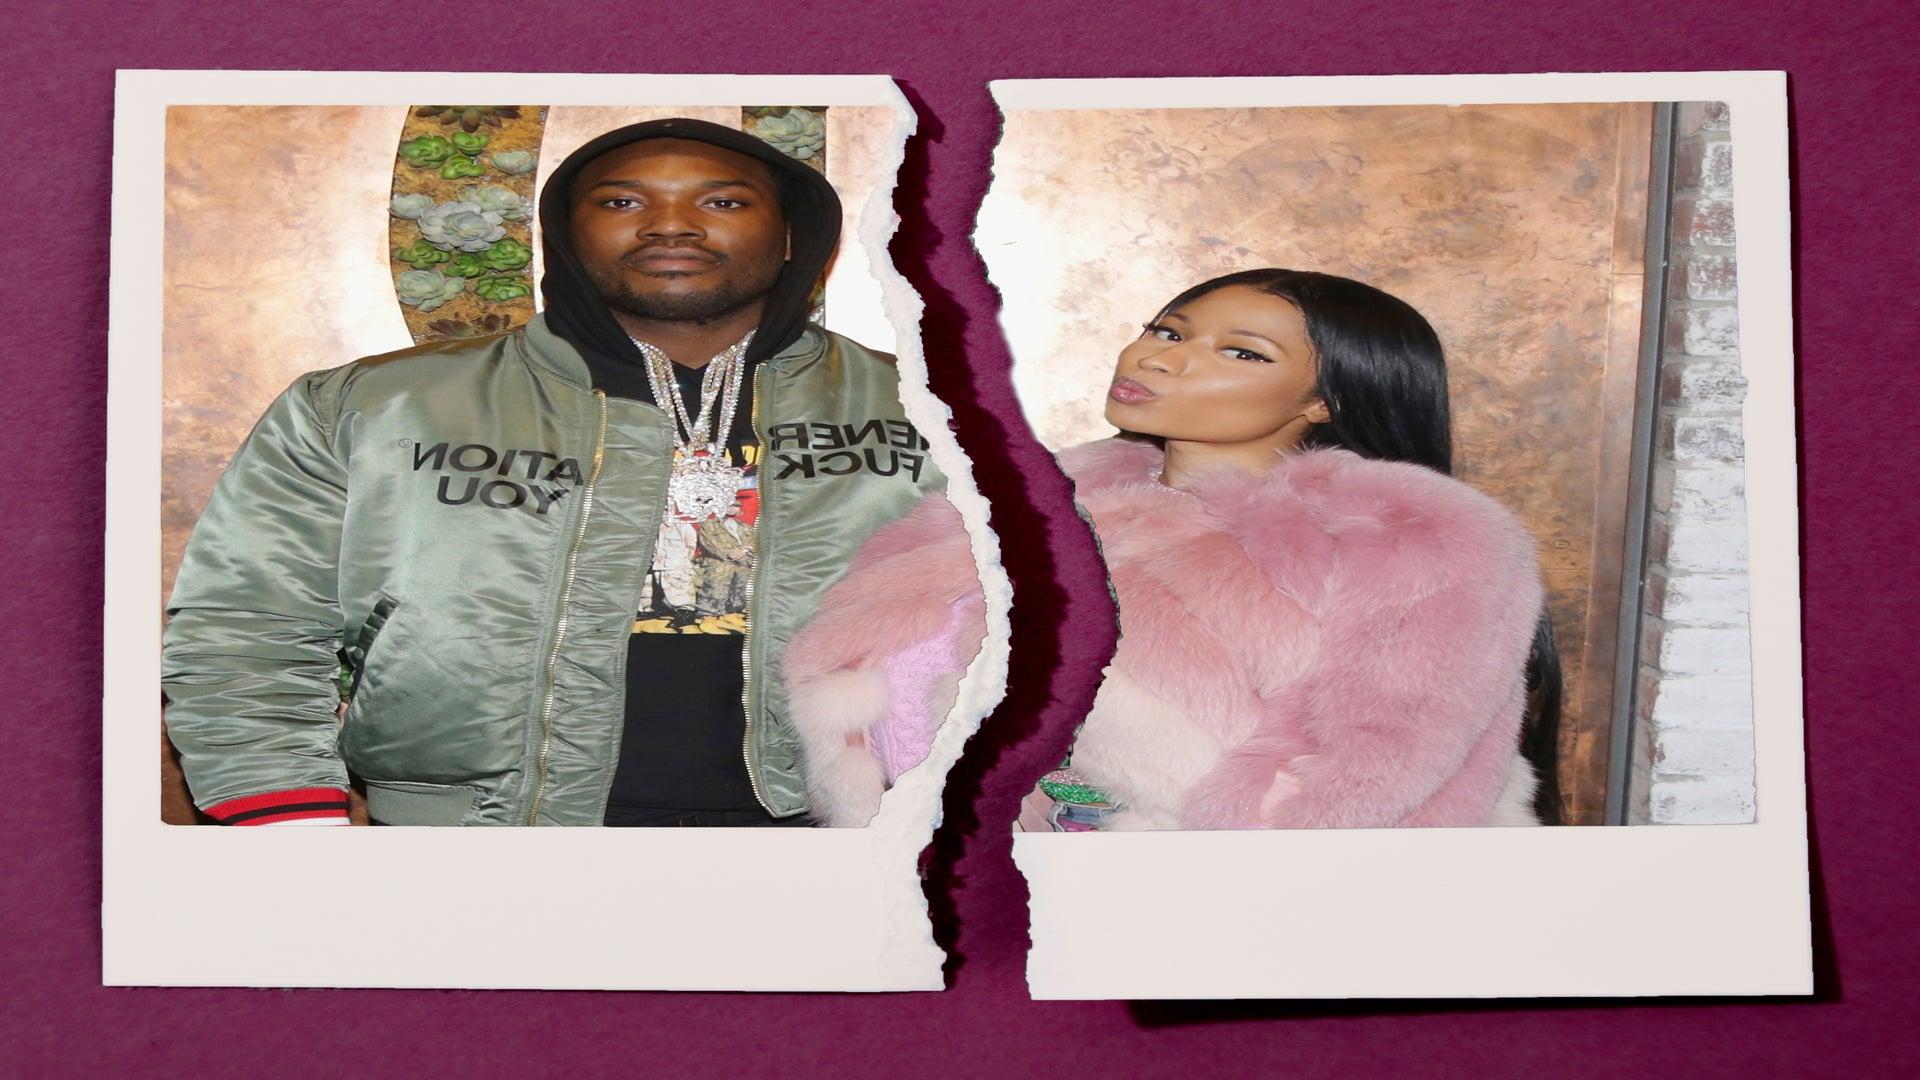 Nicki Minaj Confirms Meek Mill Breakup, The Internet Rejoices